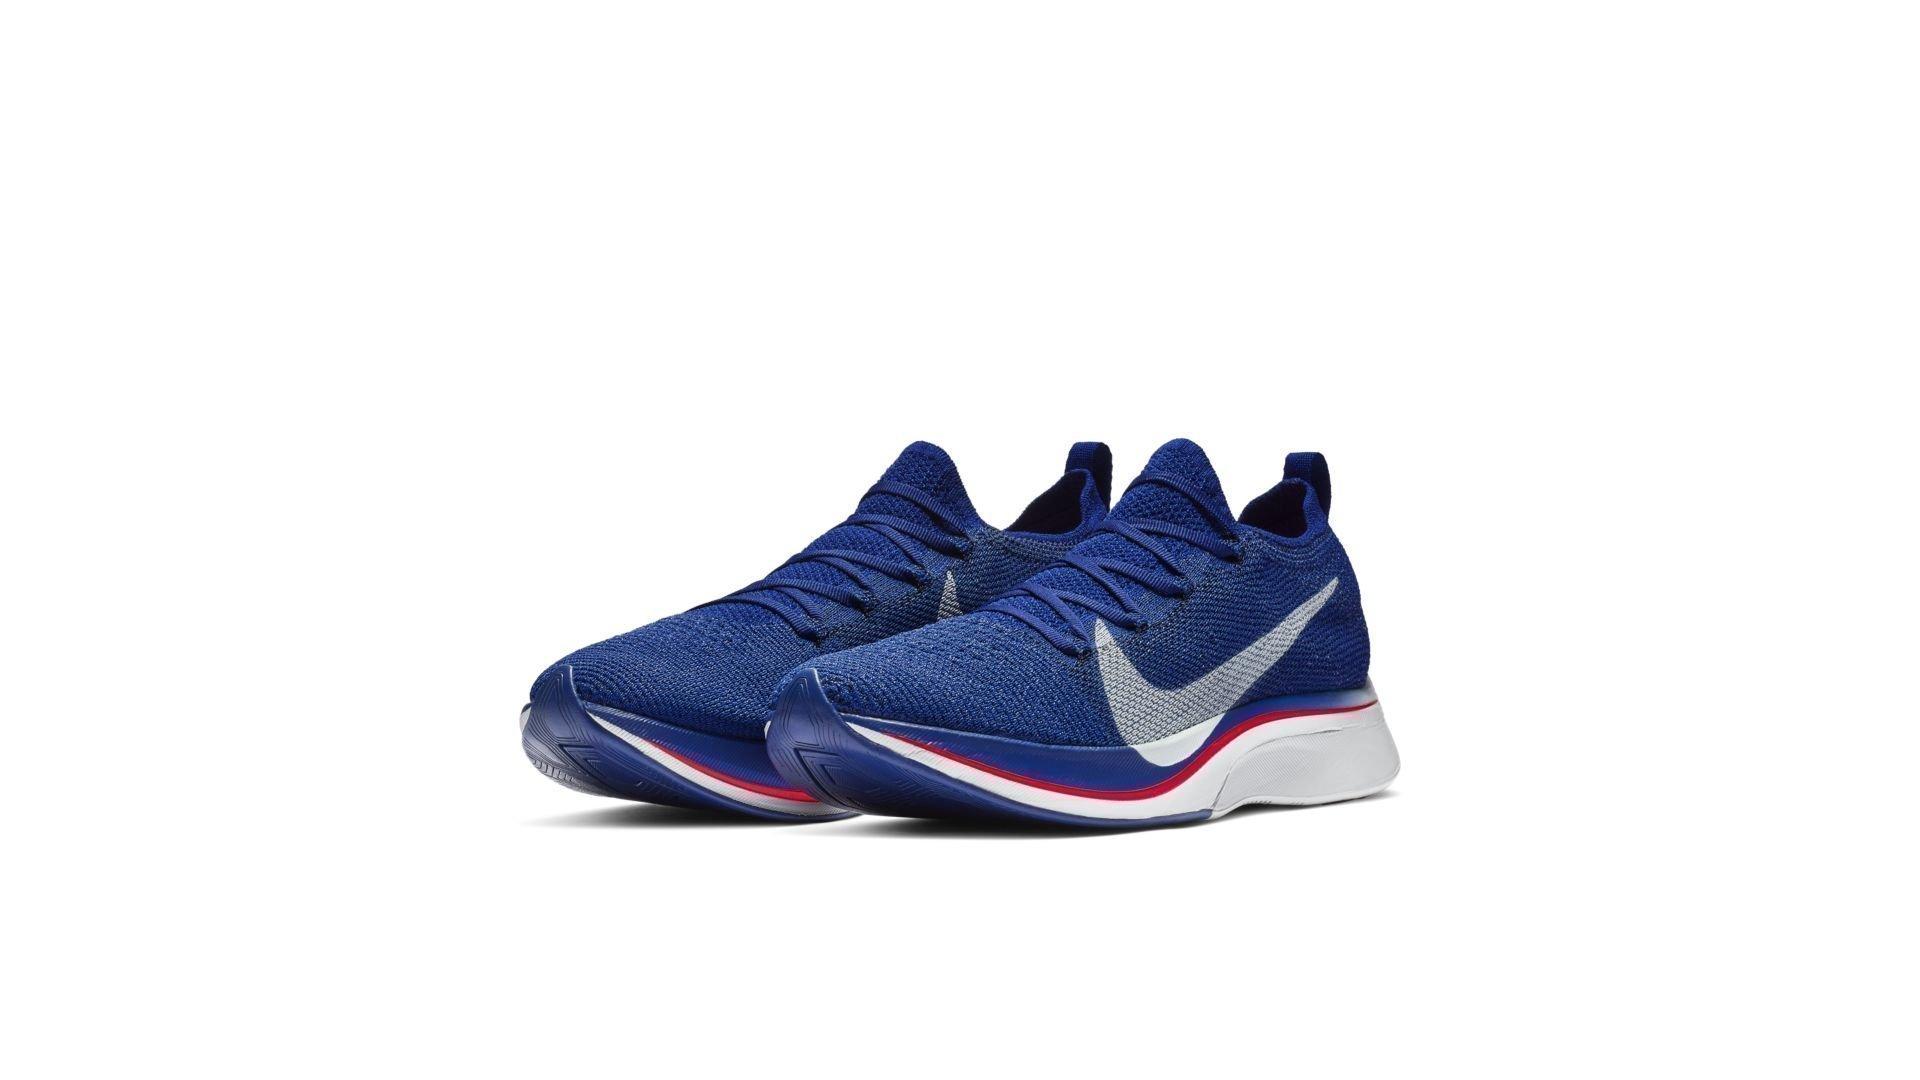 Nike Vaporfly 4% Flyknit Deep Royal Blue (AJ3857-400)